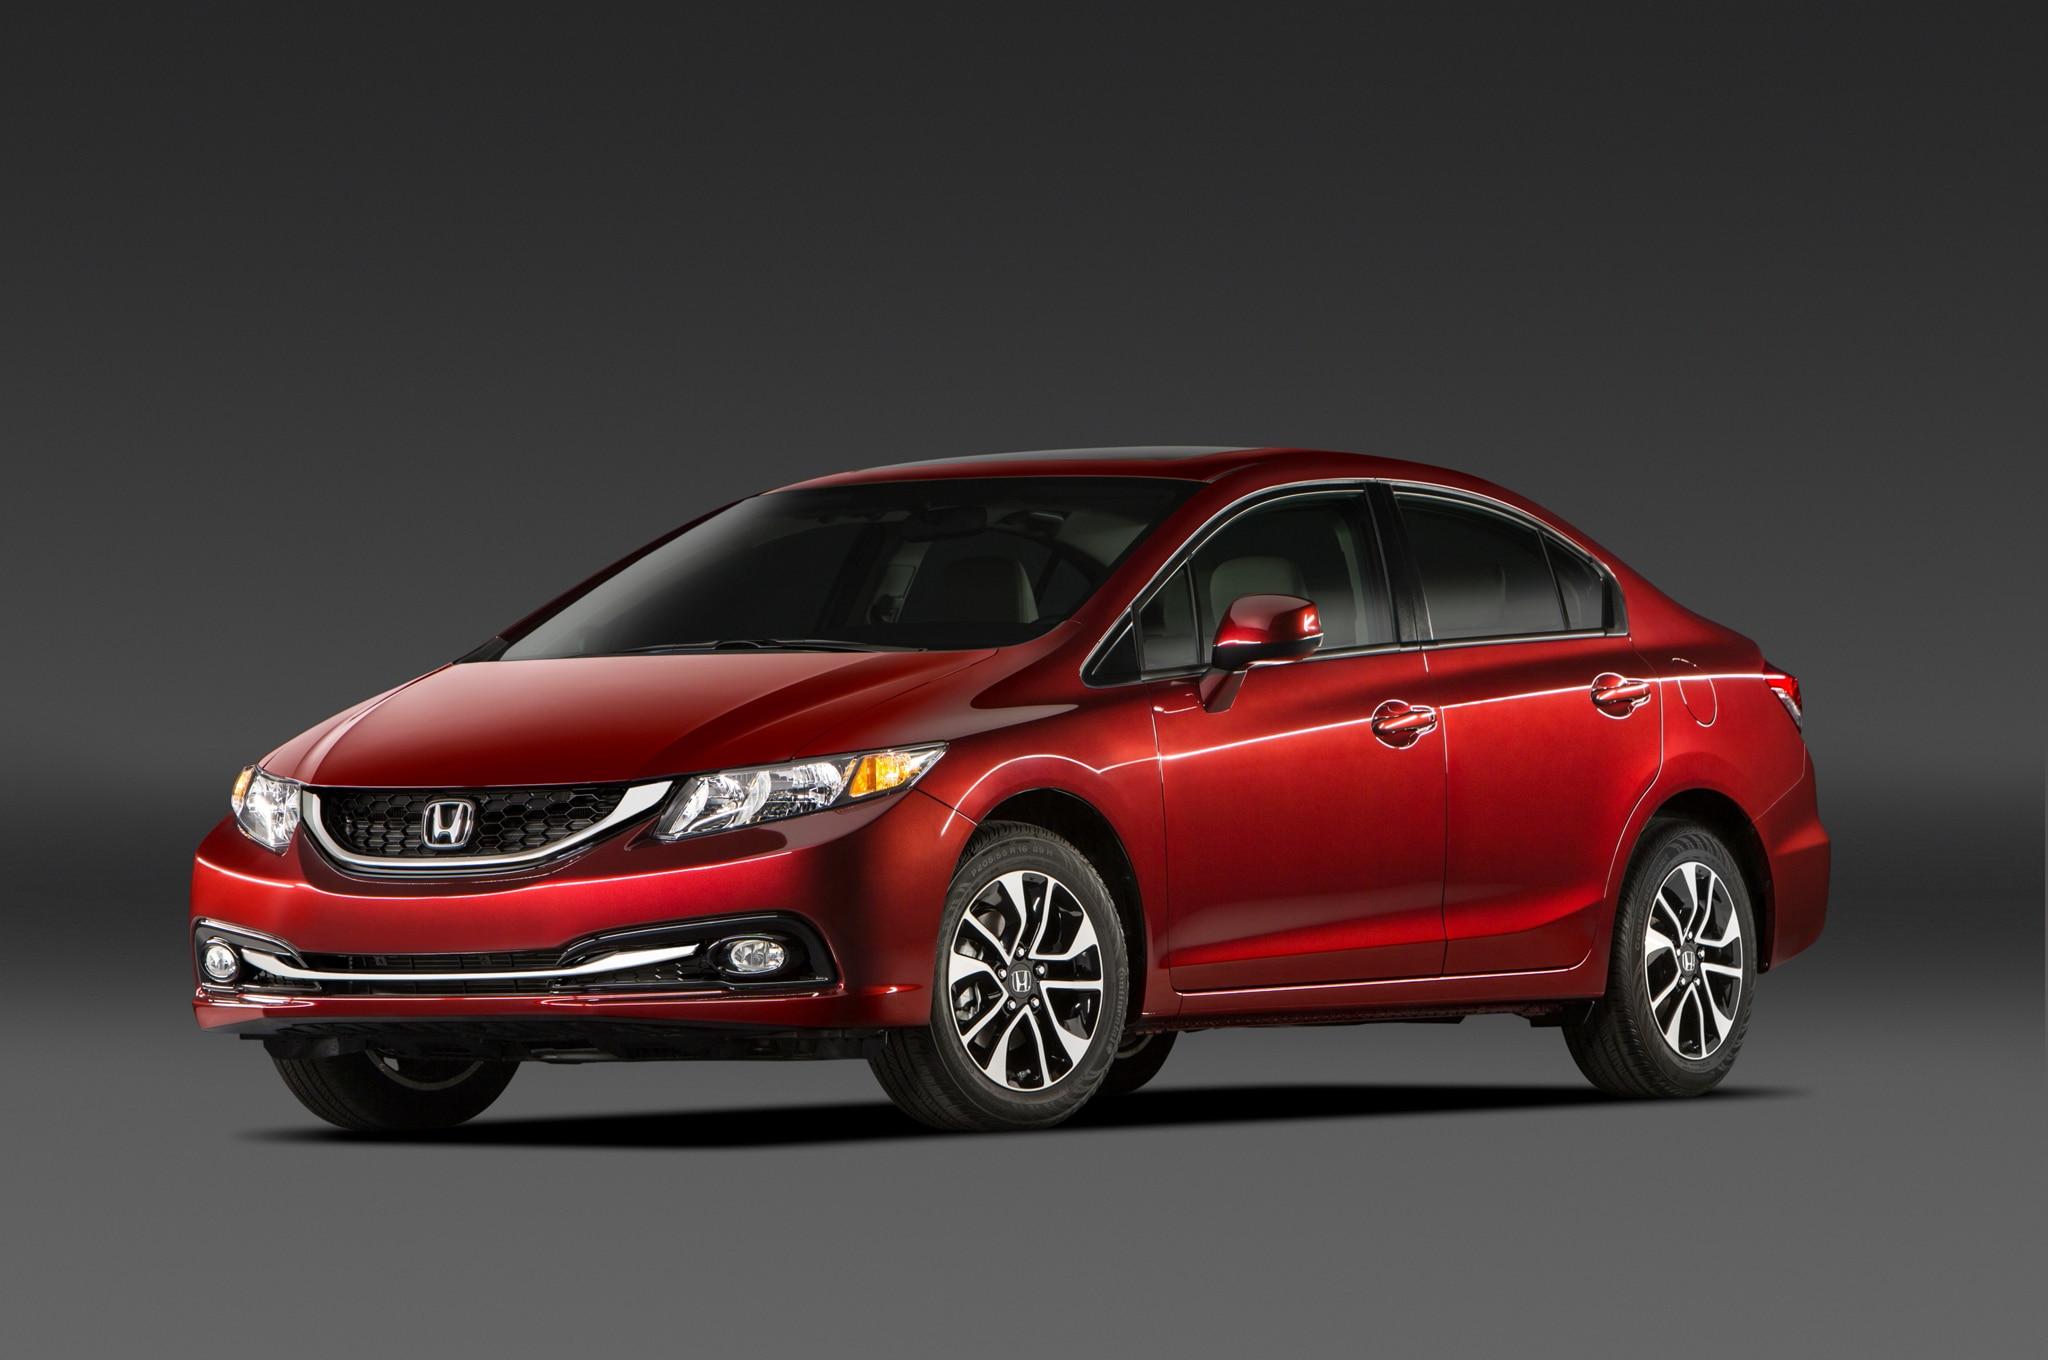 2013 Honda Civic Sedan Front Three Quarter1